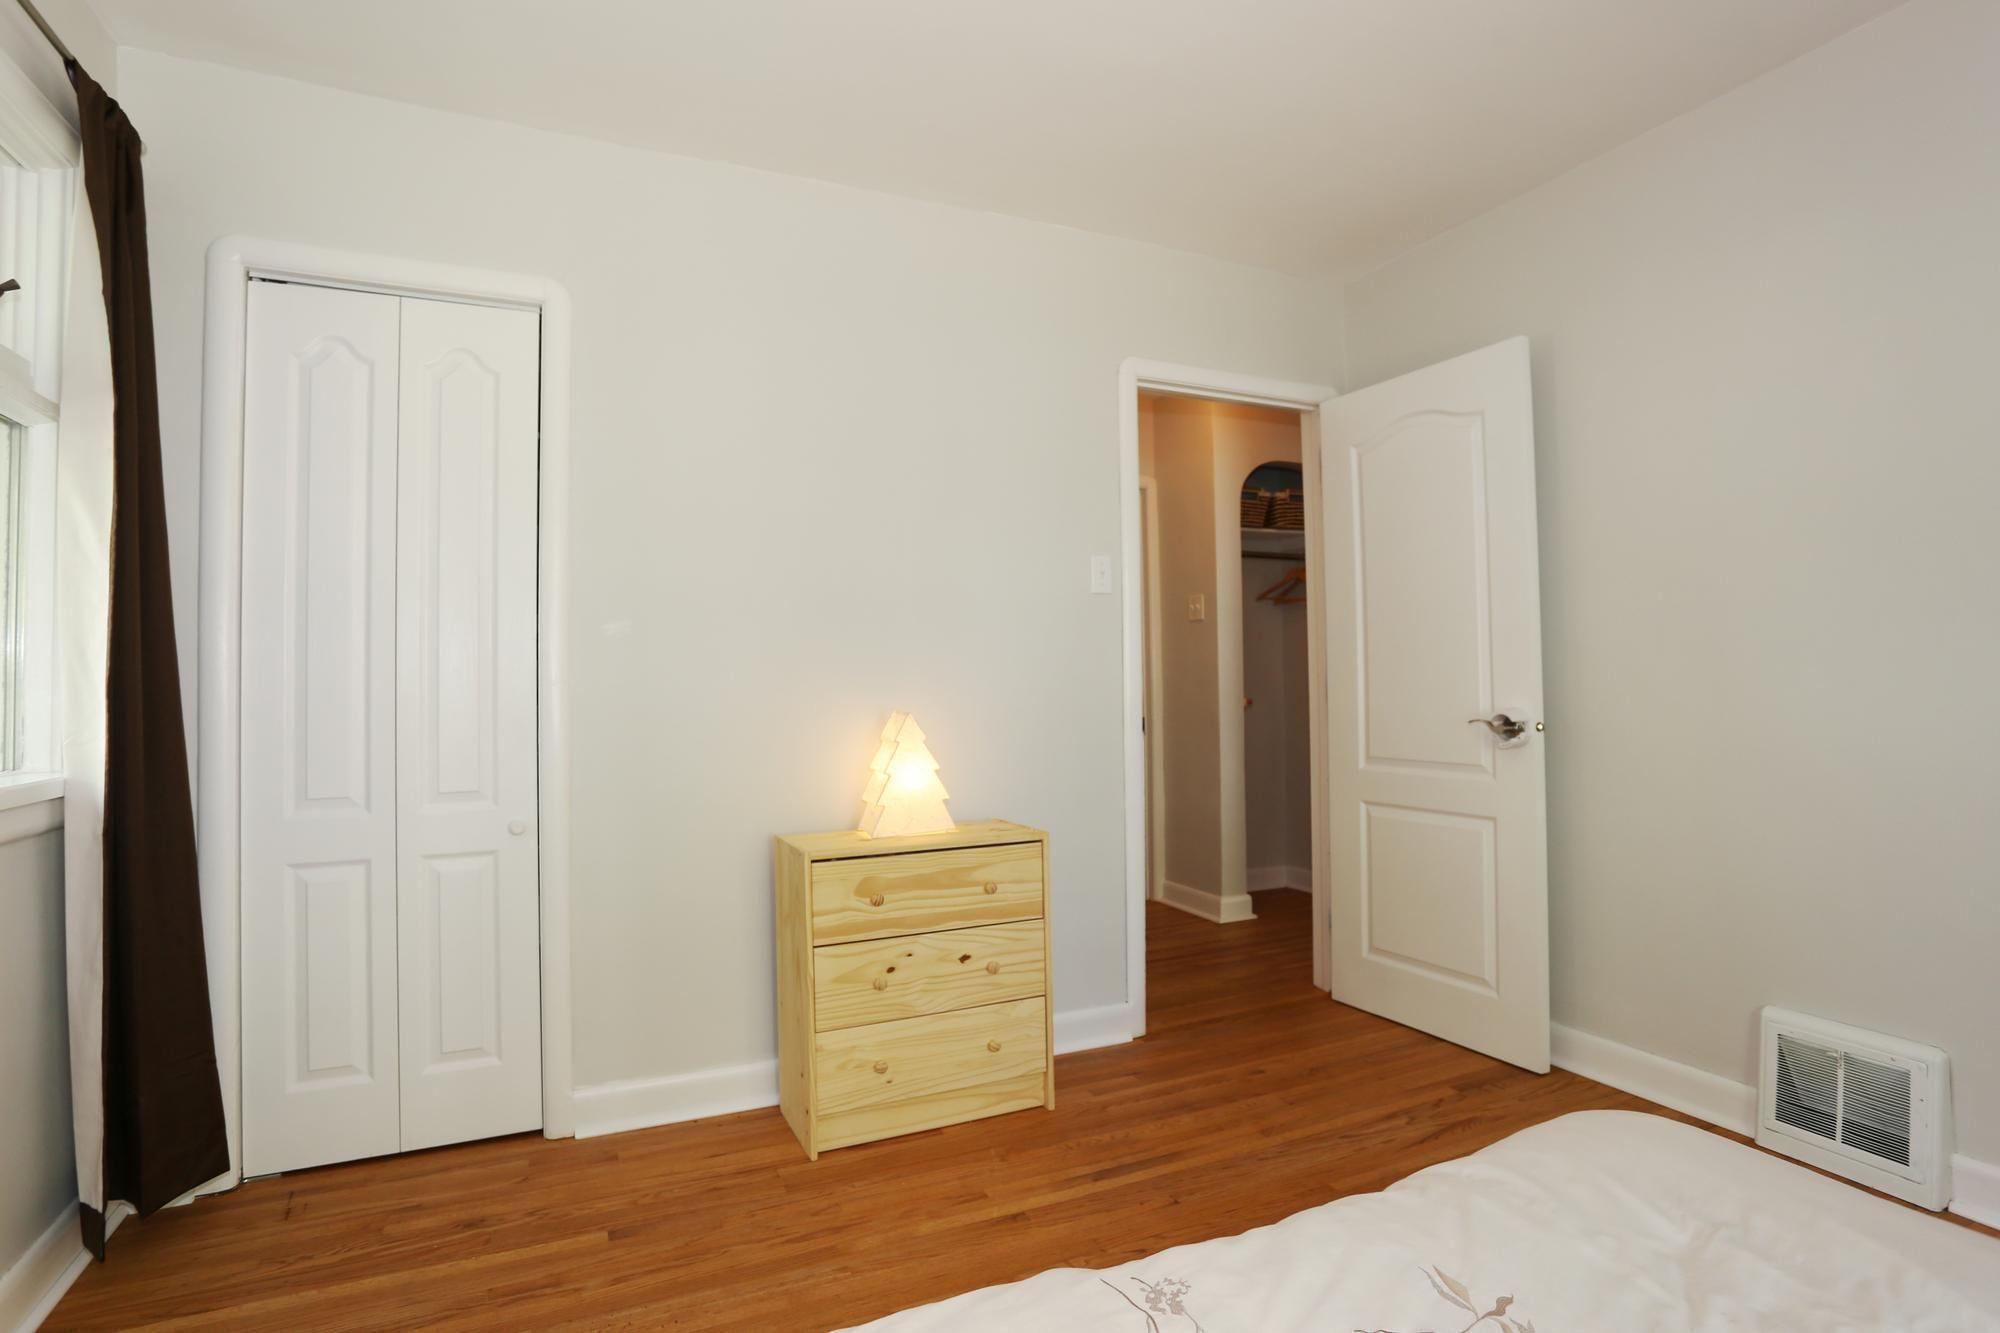 Photo 16: Photos: 290 McLeod Avenue in Winnipeg: North Kildonan Single Family Detached for sale (3F)  : MLS®# 1814938